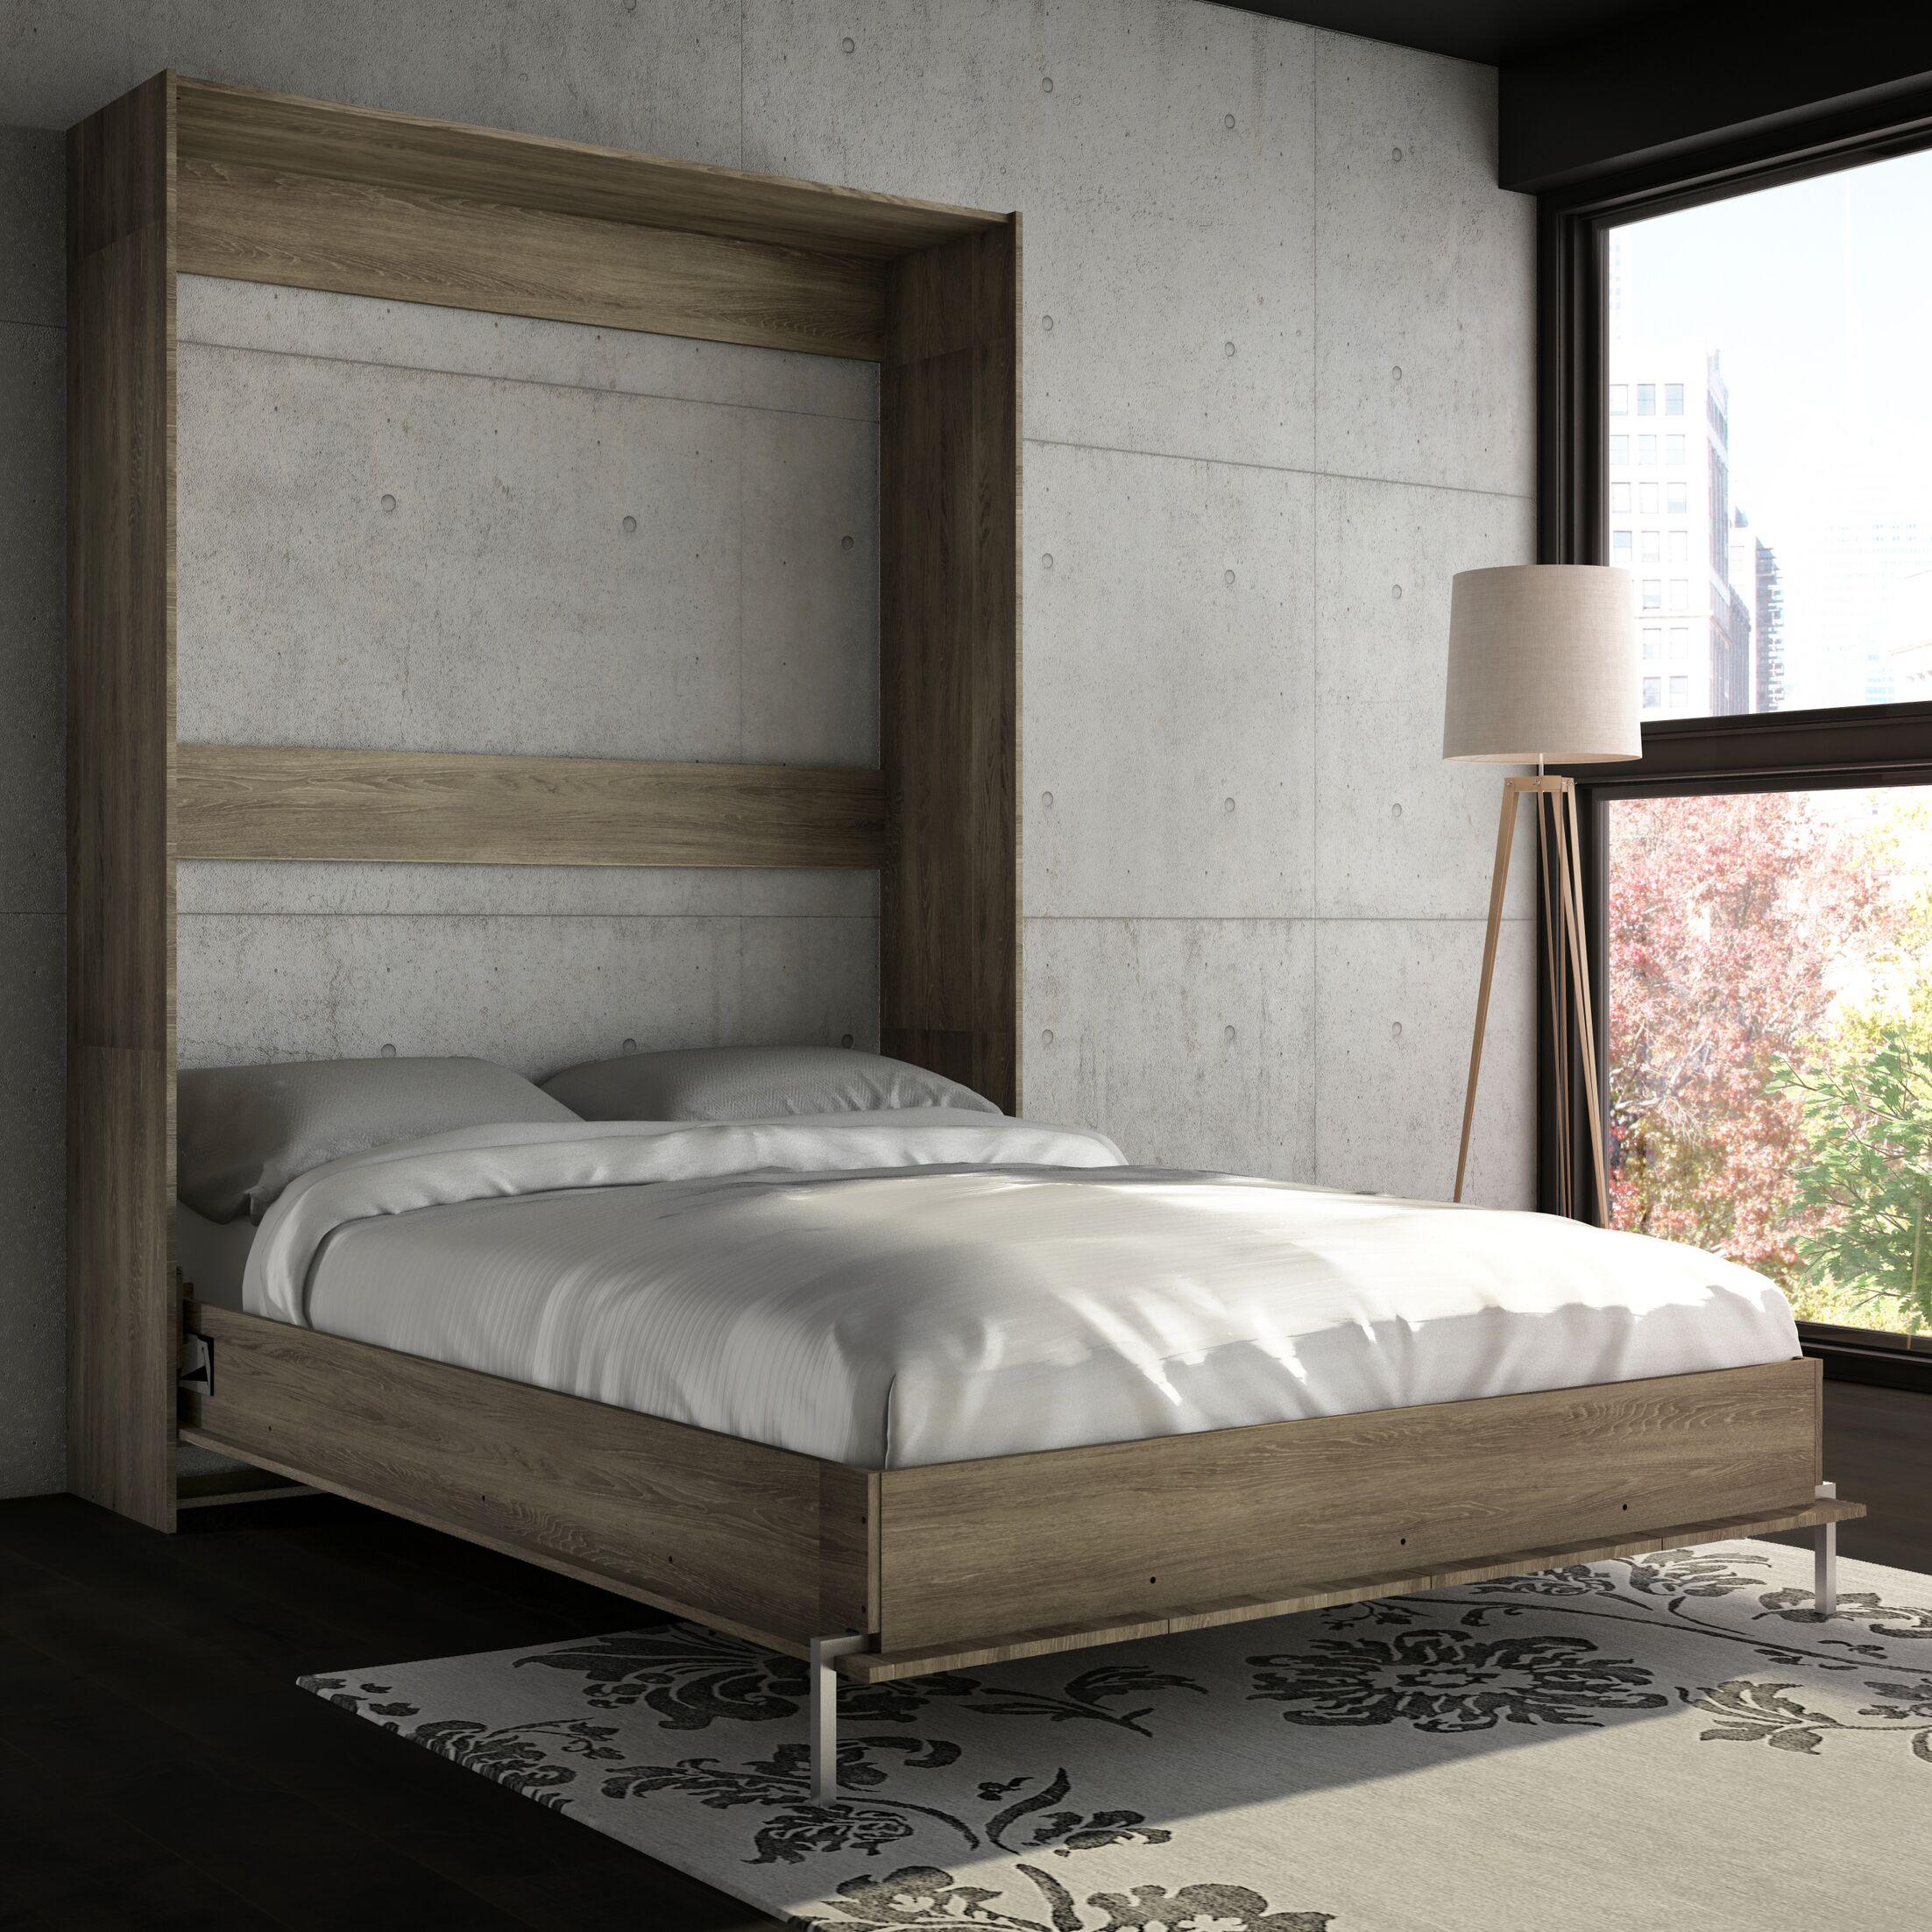 Lower Weston Murphy Bed Size: Queen, Color: Rustic Cinnamon